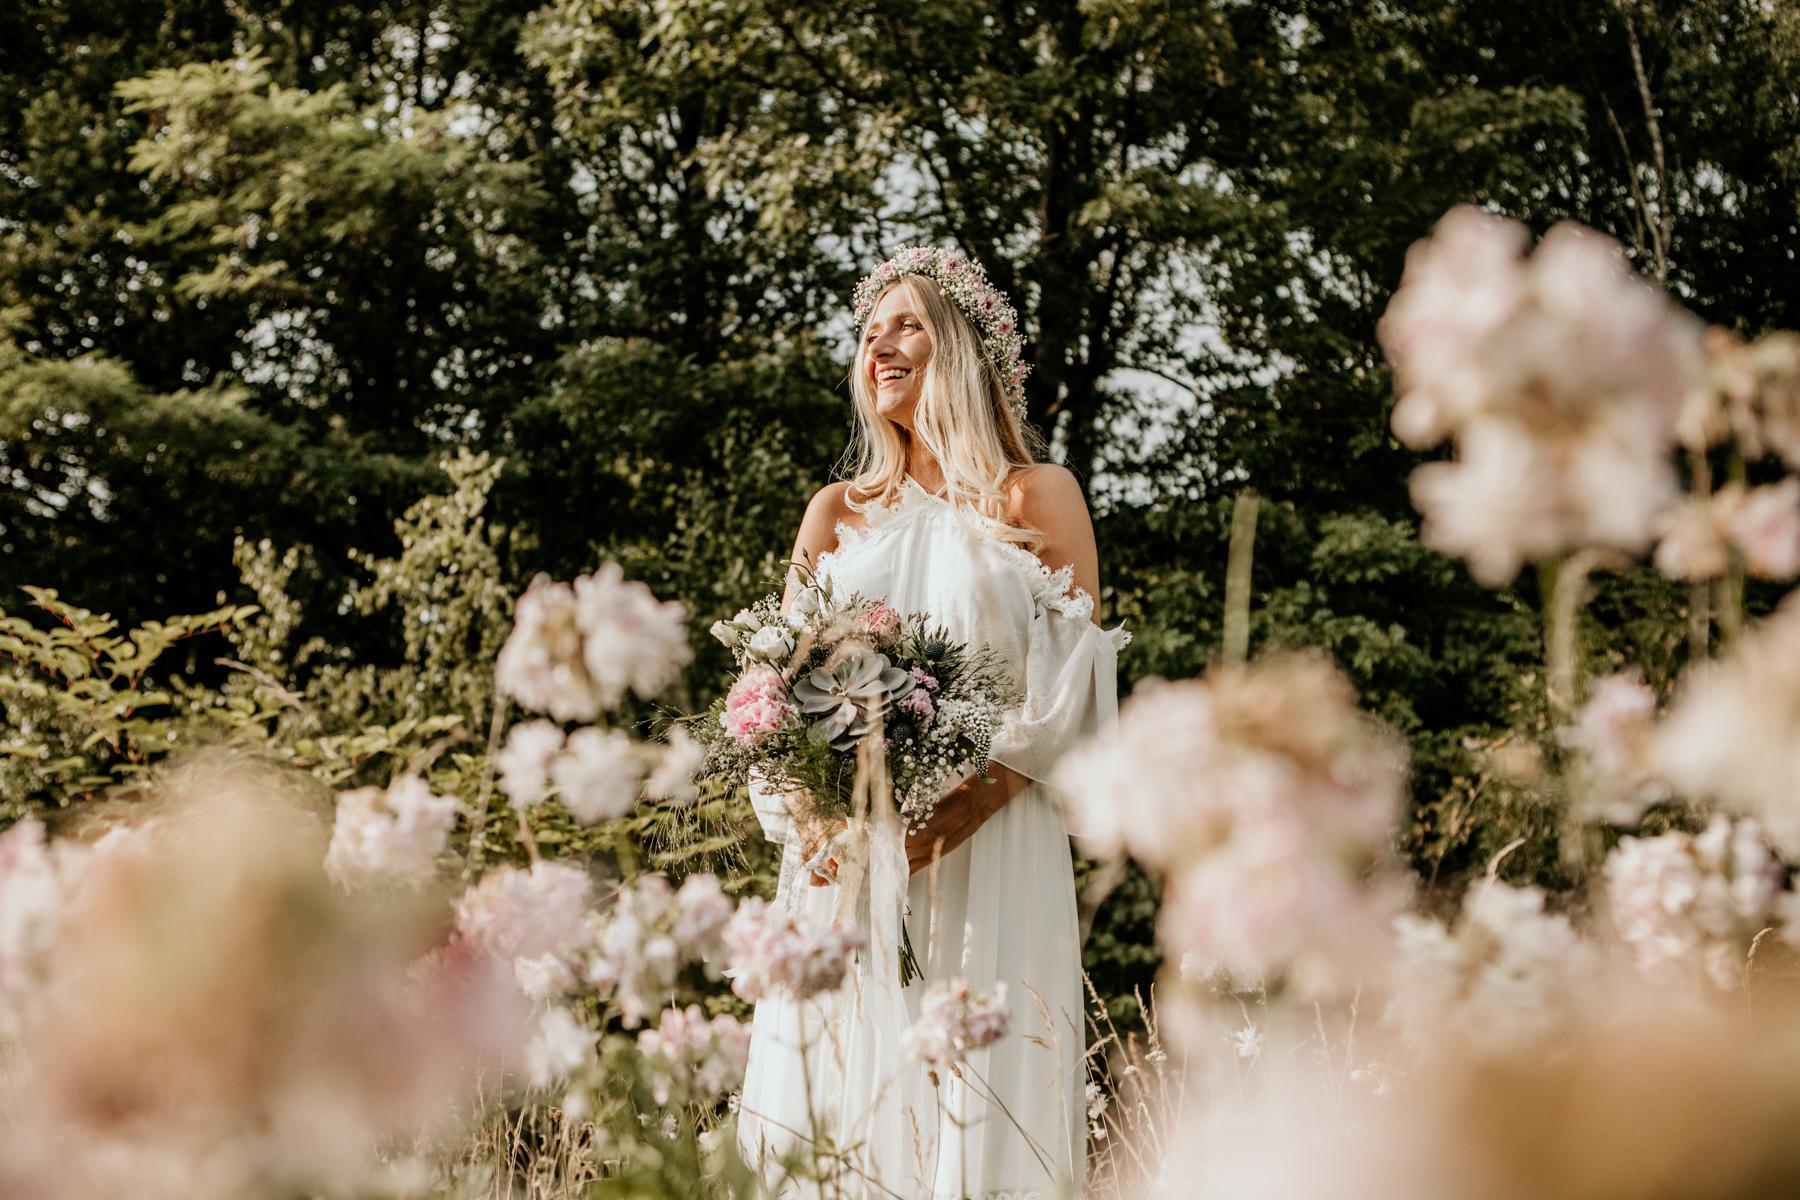 Styled Wedding 1 beeld.schoon-selinderella klein formaat-84 2